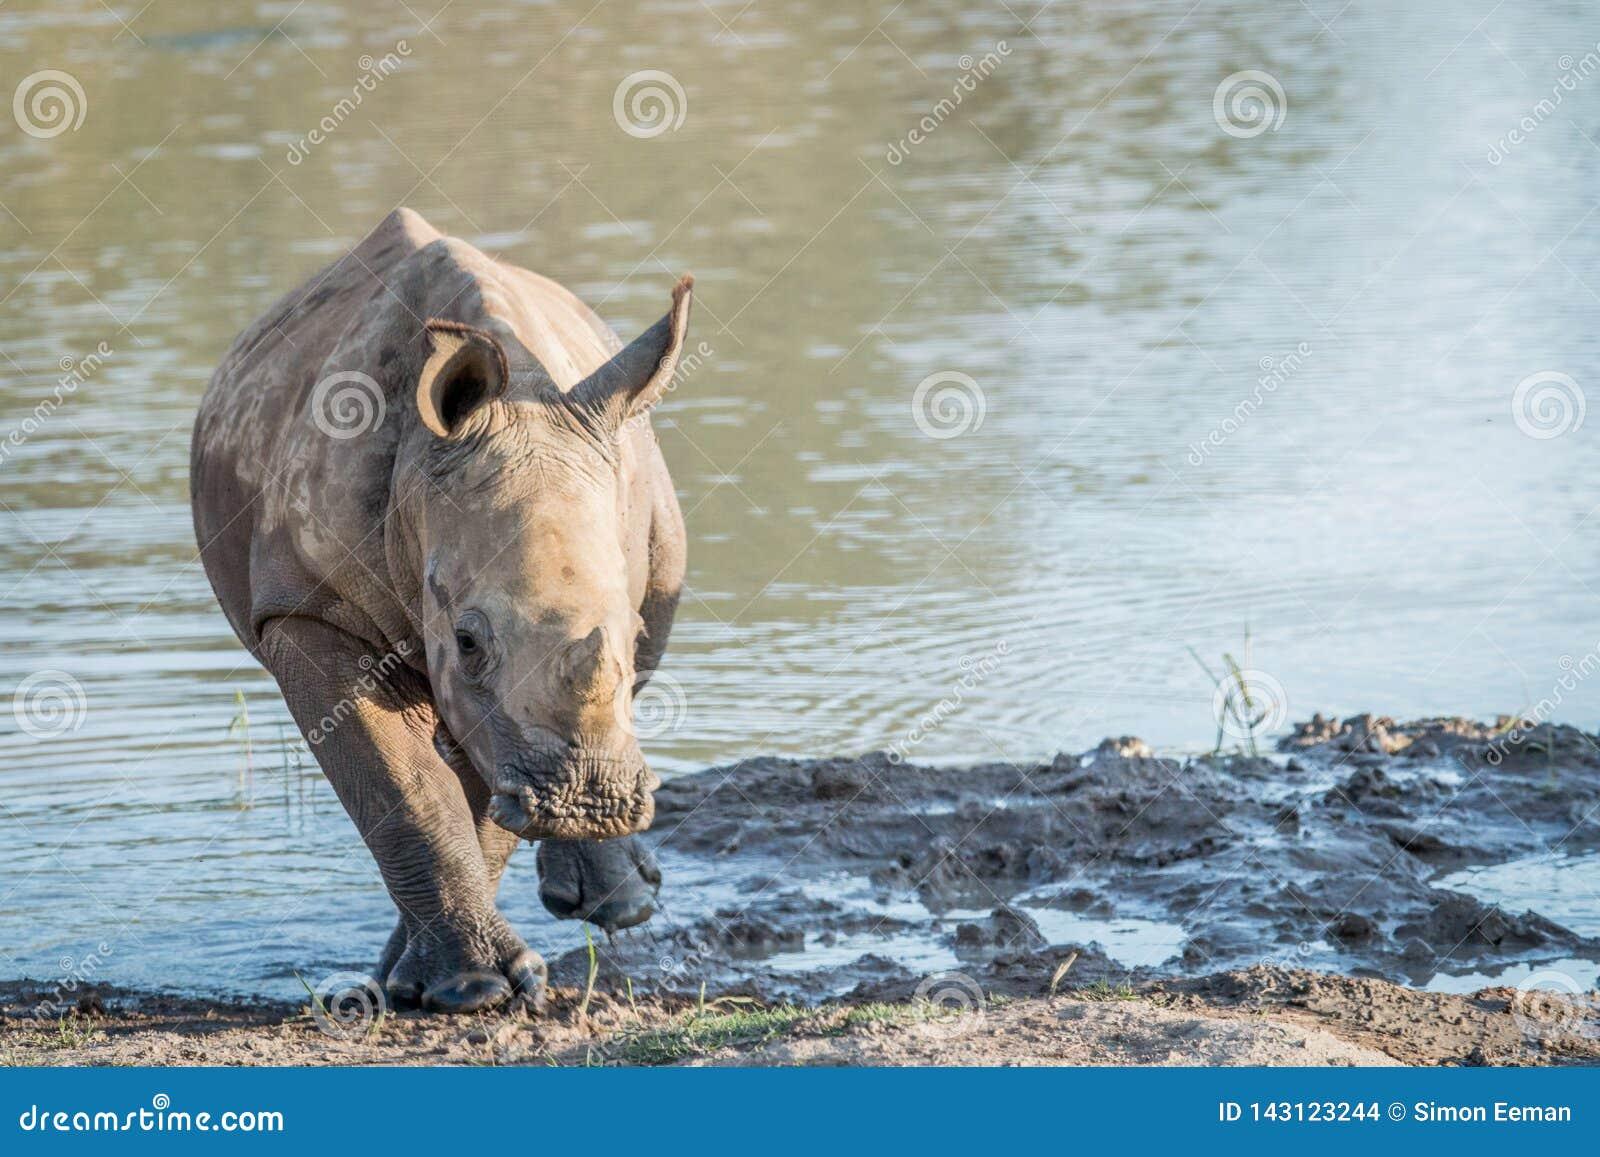 Икра носорога младенца белая играя в воде